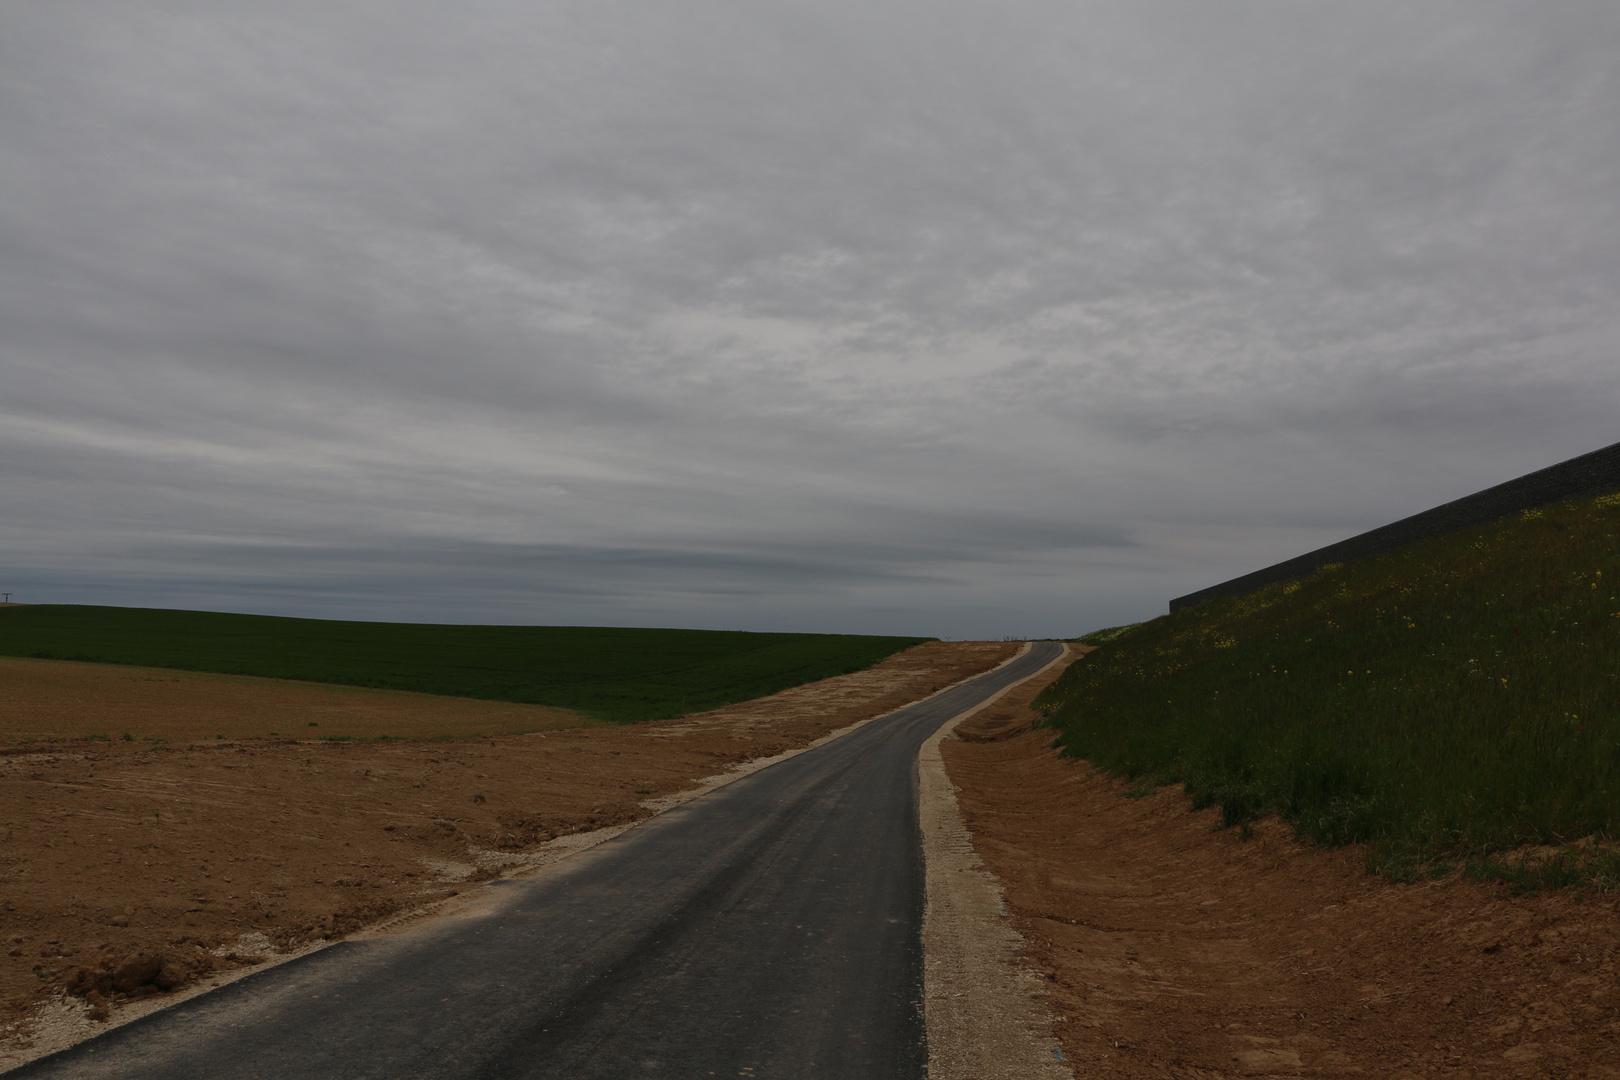 NEU - Die Straße